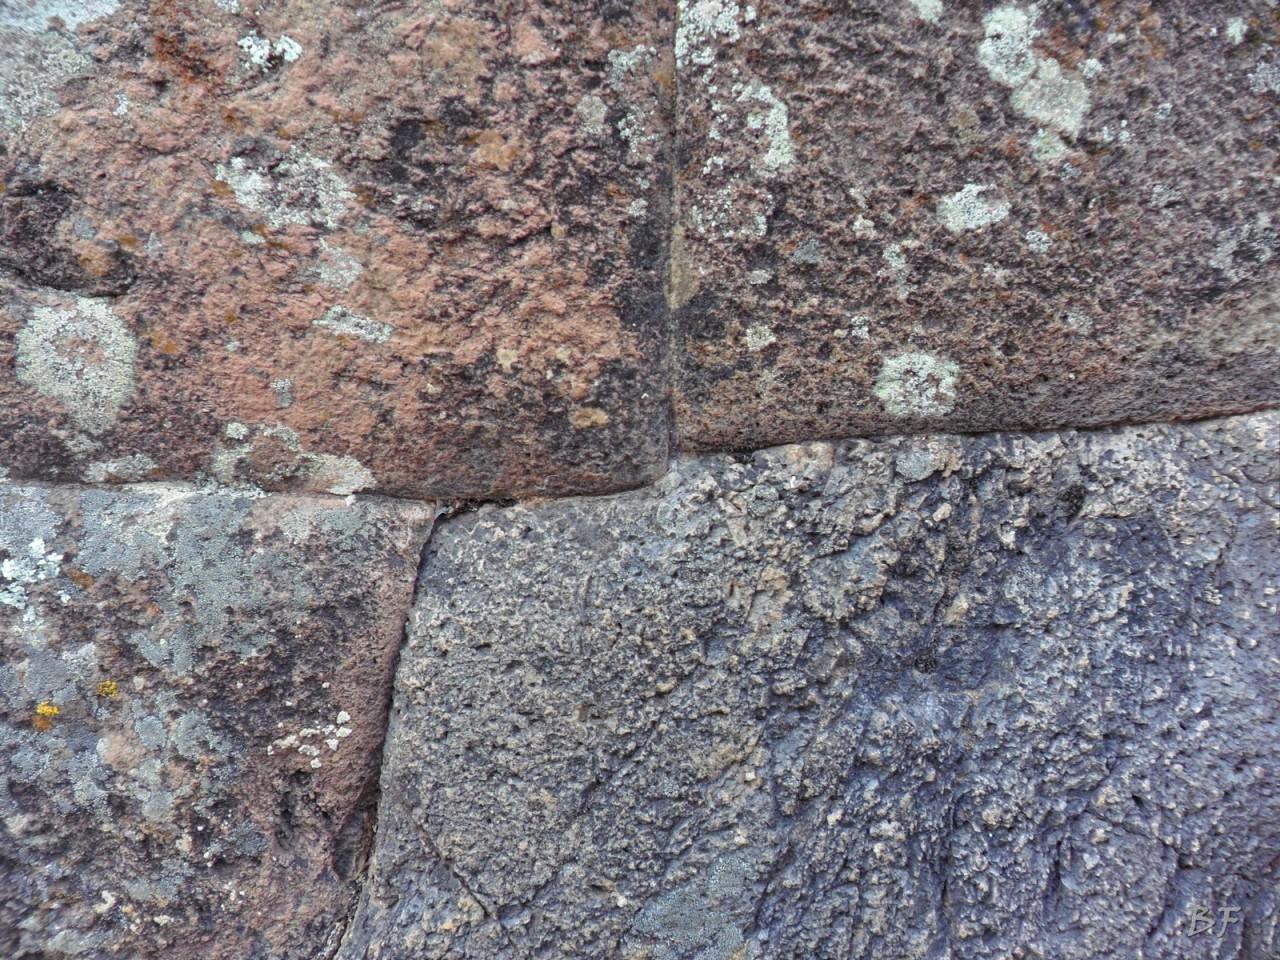 Mura-Poligonali-Megaliti-Altari-Rupestri-Pisac-Cusco-Perù-57